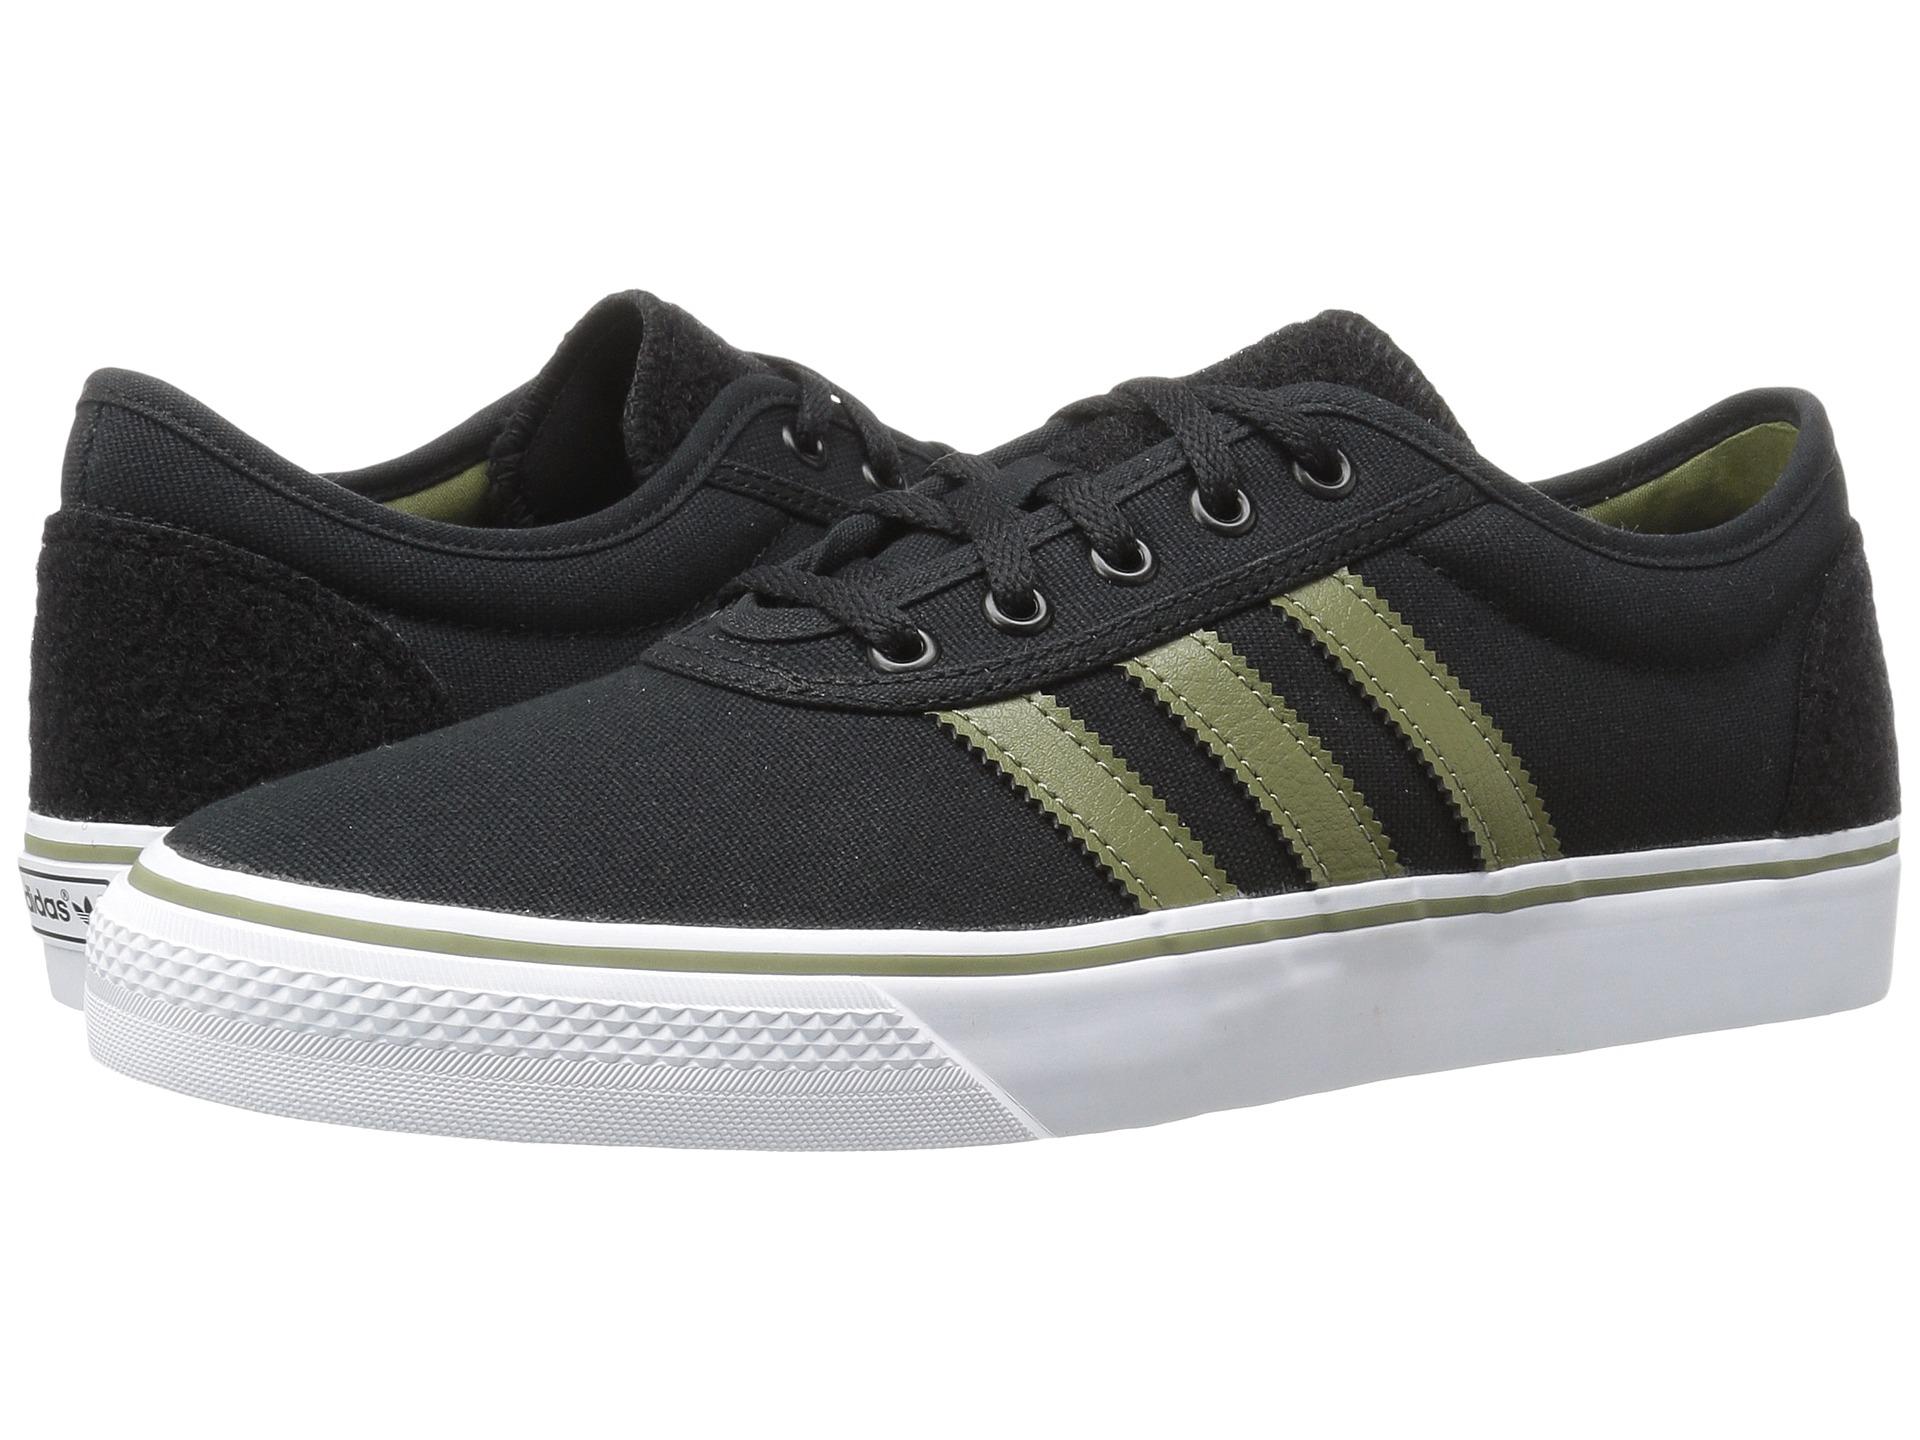 adidas Skateboarding Adi-Ease at 6pm.com